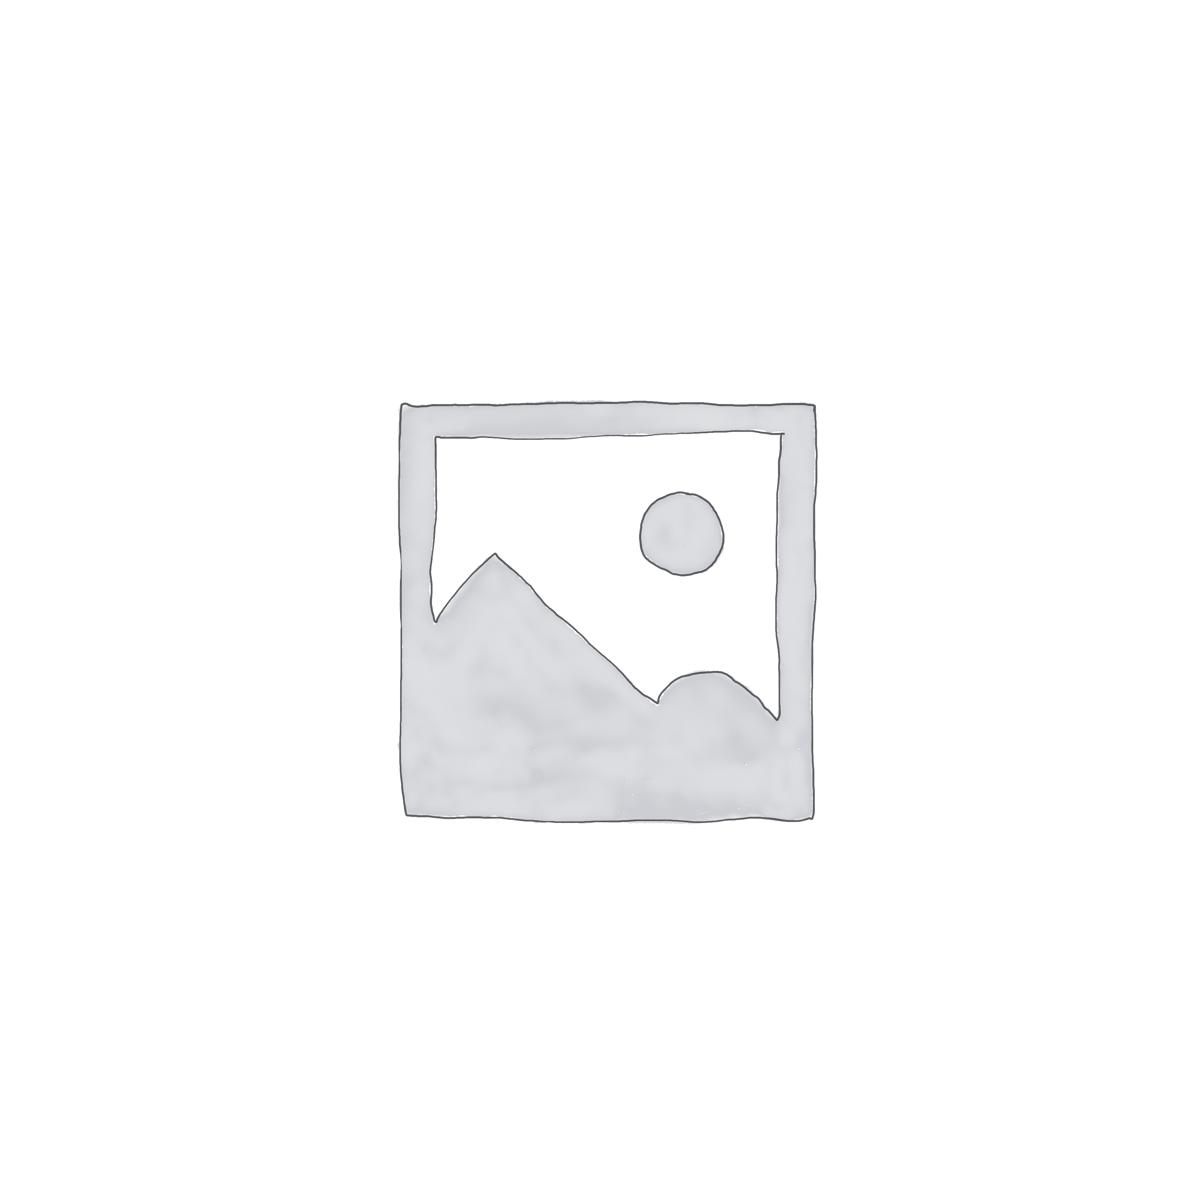 Dark Floral  Pink Chrysanthemum and Green Leaves Wallpaper Mural